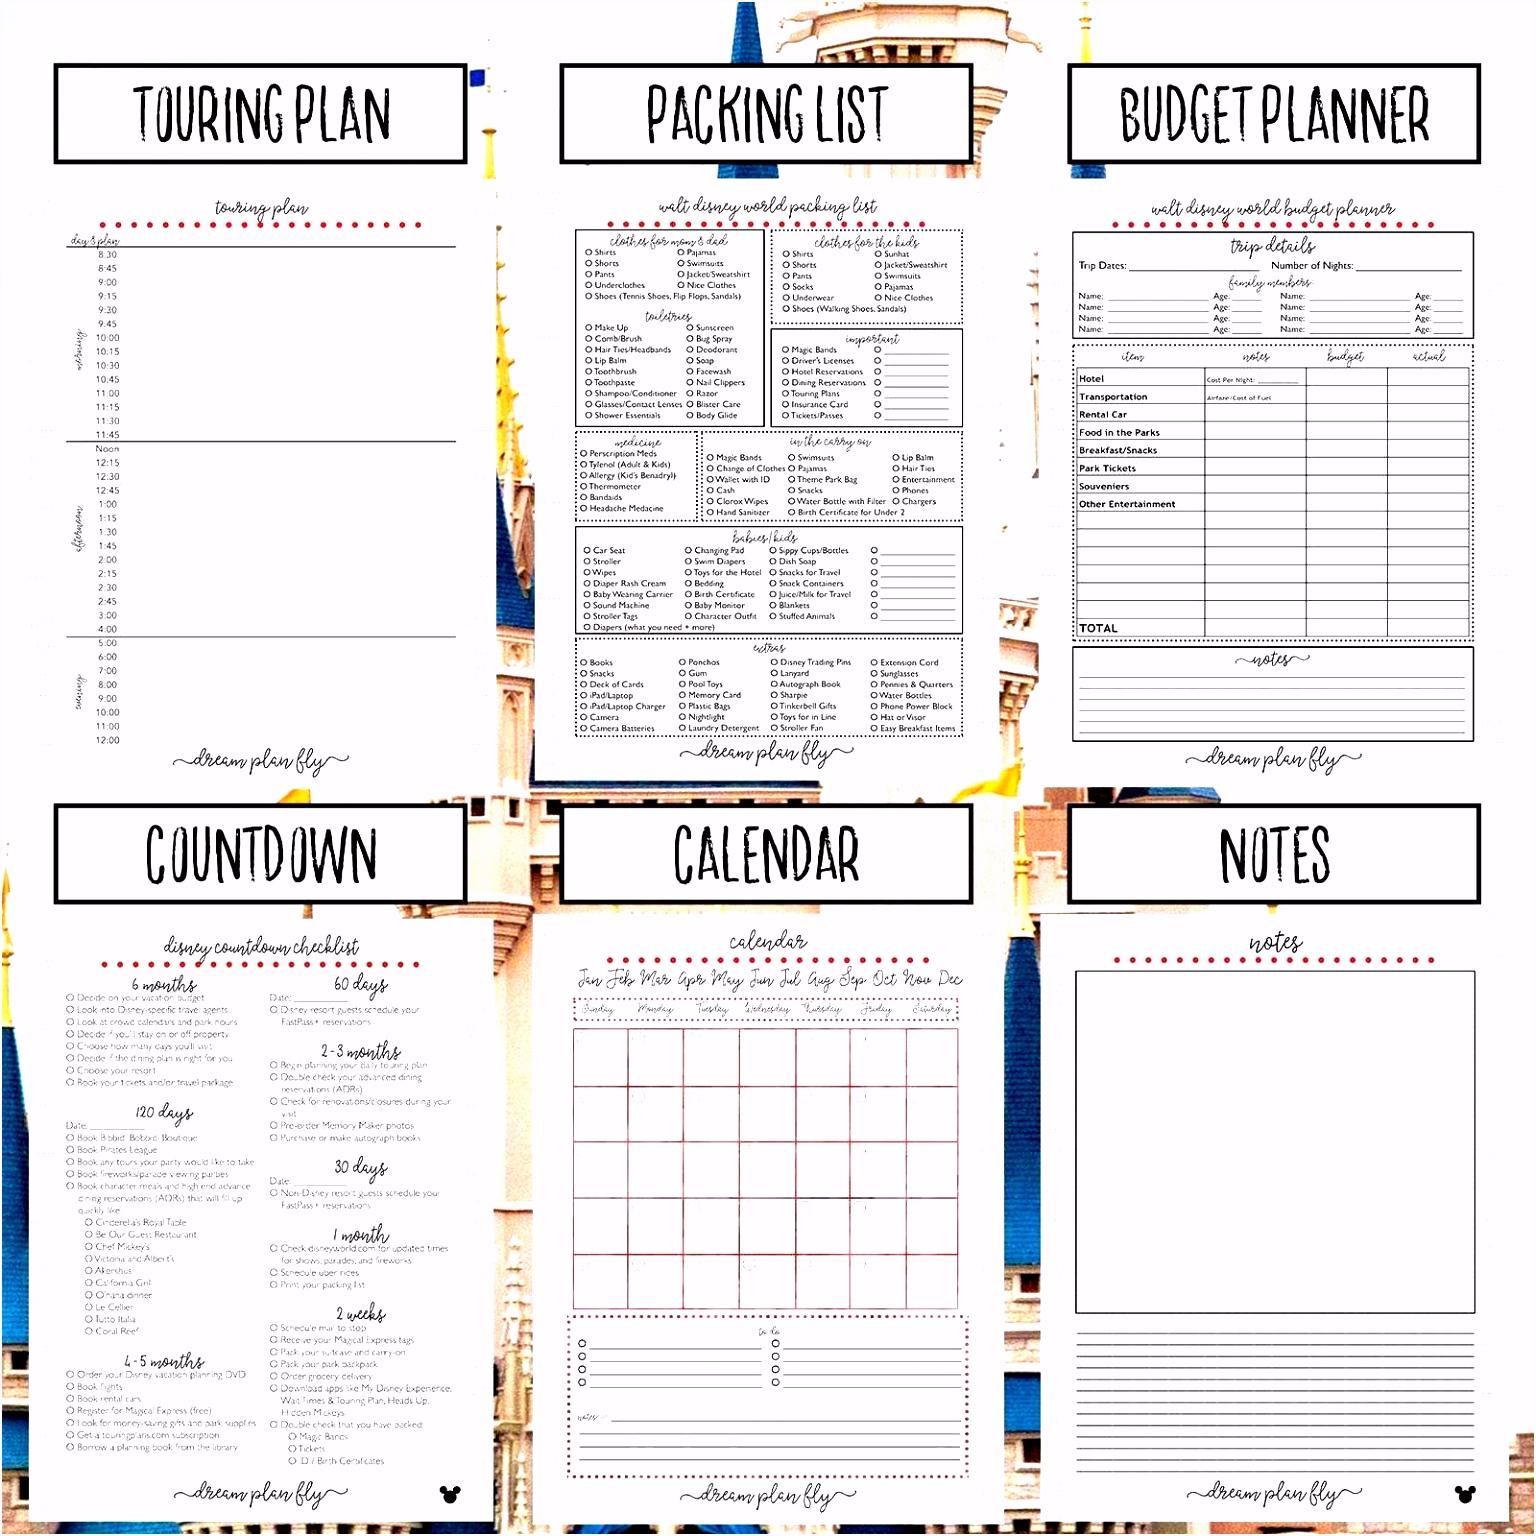 Liquiditatsplan Vorlage Excel Kostenlos Planungstool Excel I9cr78ddl6 Xscxm2ngt6